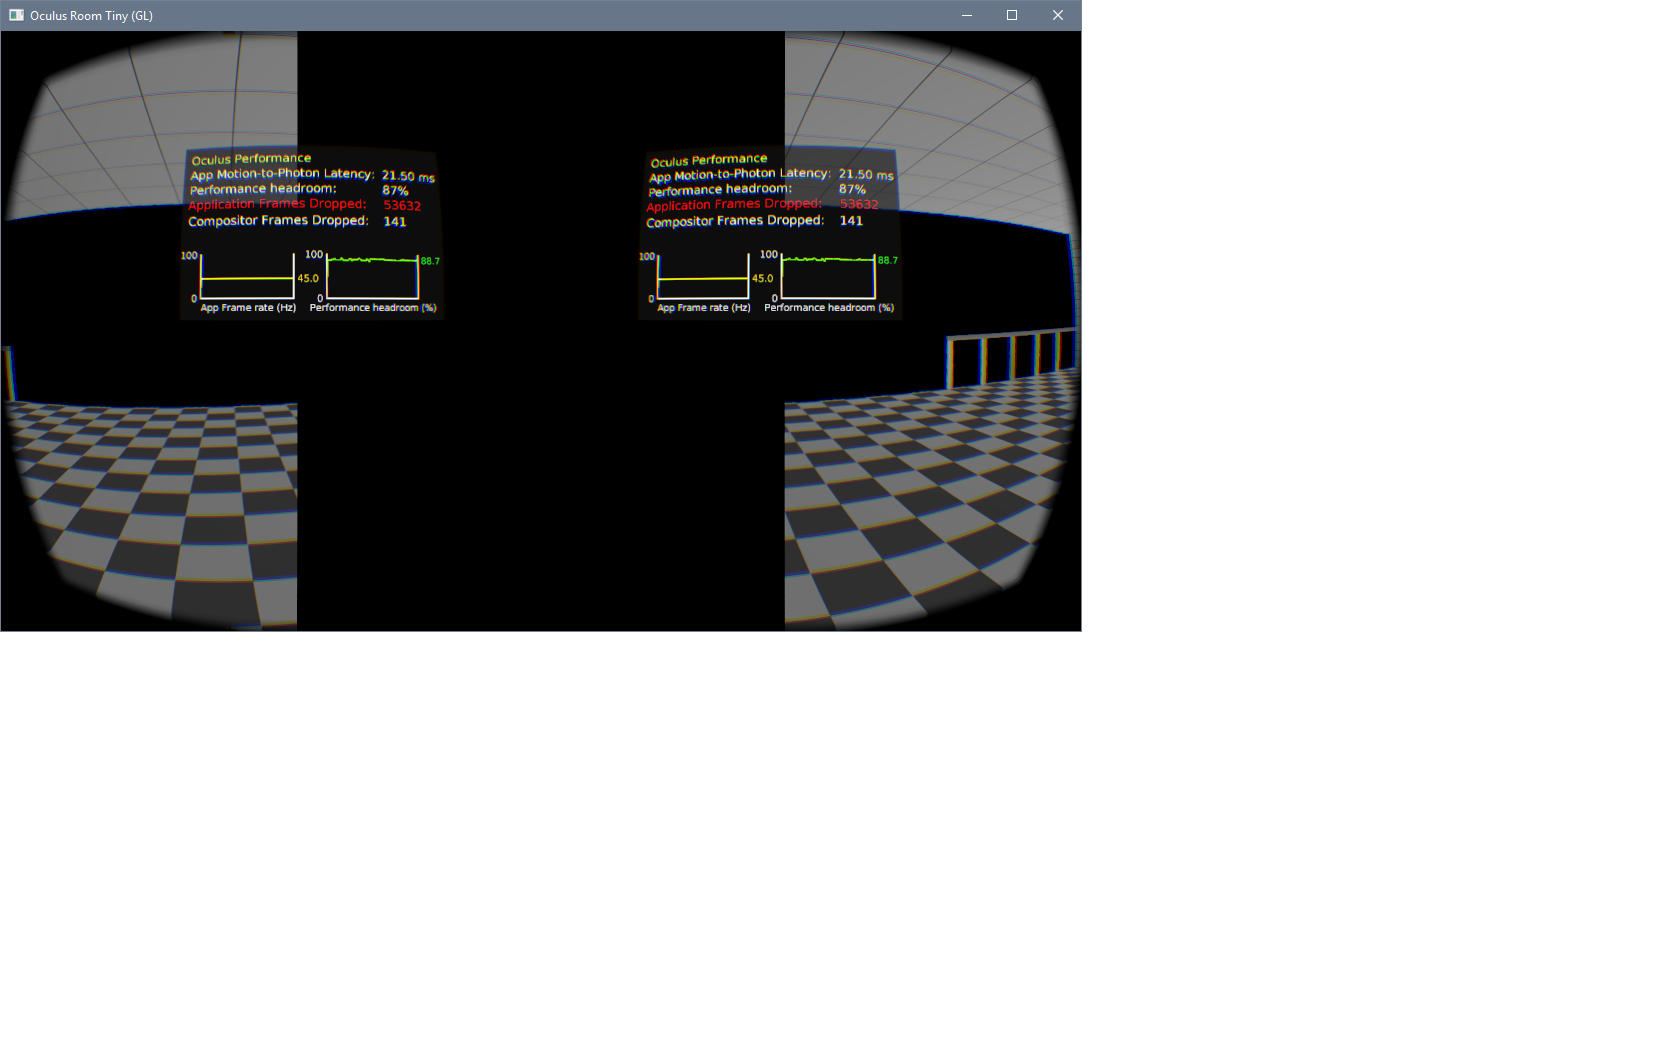 ASW Black Bar Flickering in Each Eye (OpenGL) — Oculus